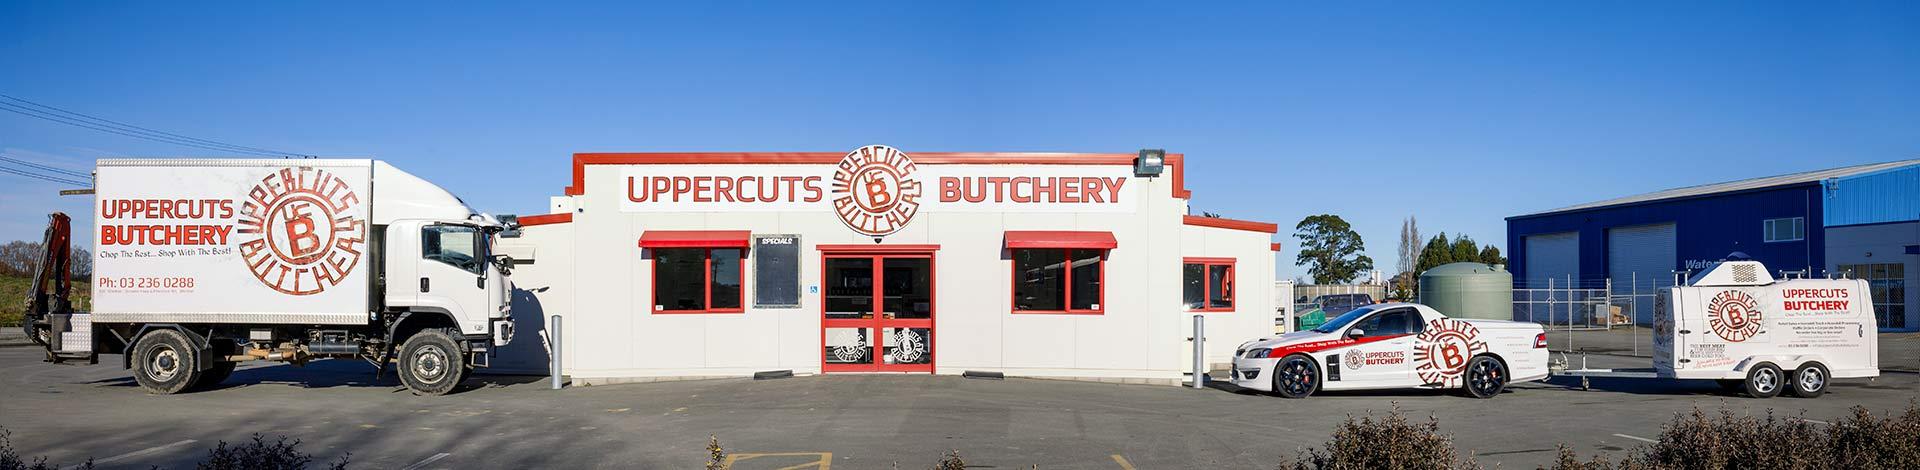 Uppercuts Butchery Banner Image